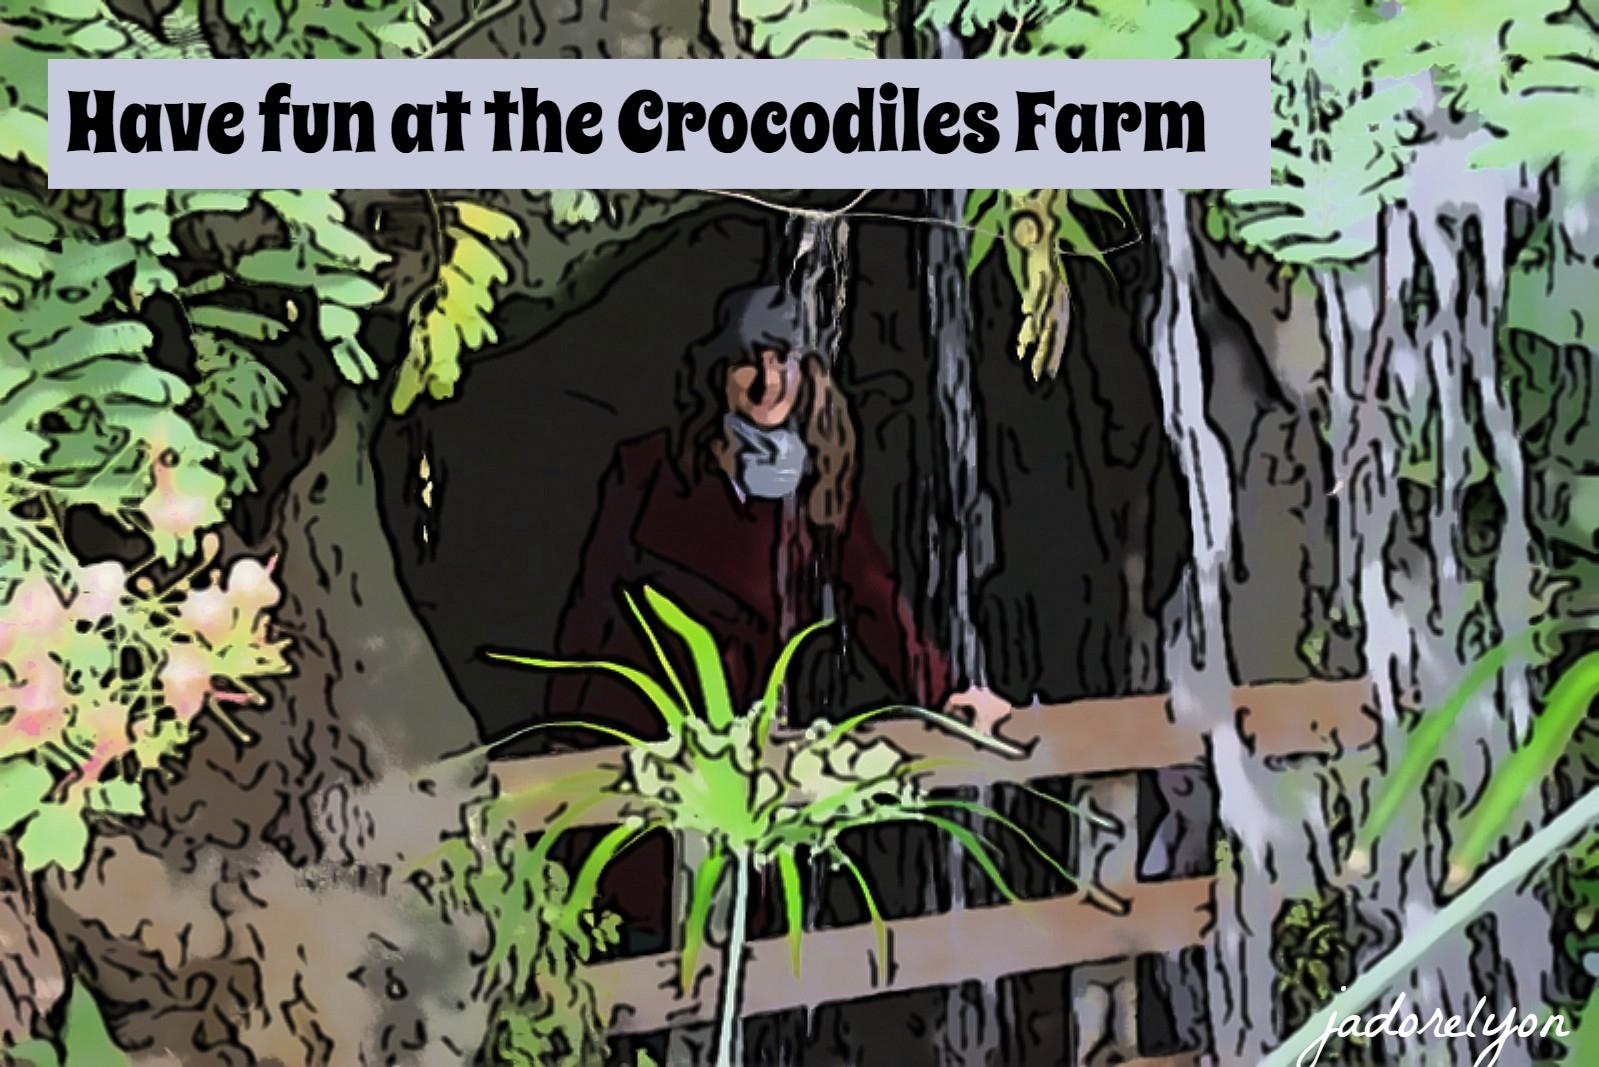 Have fun at the Crocodiles Farm